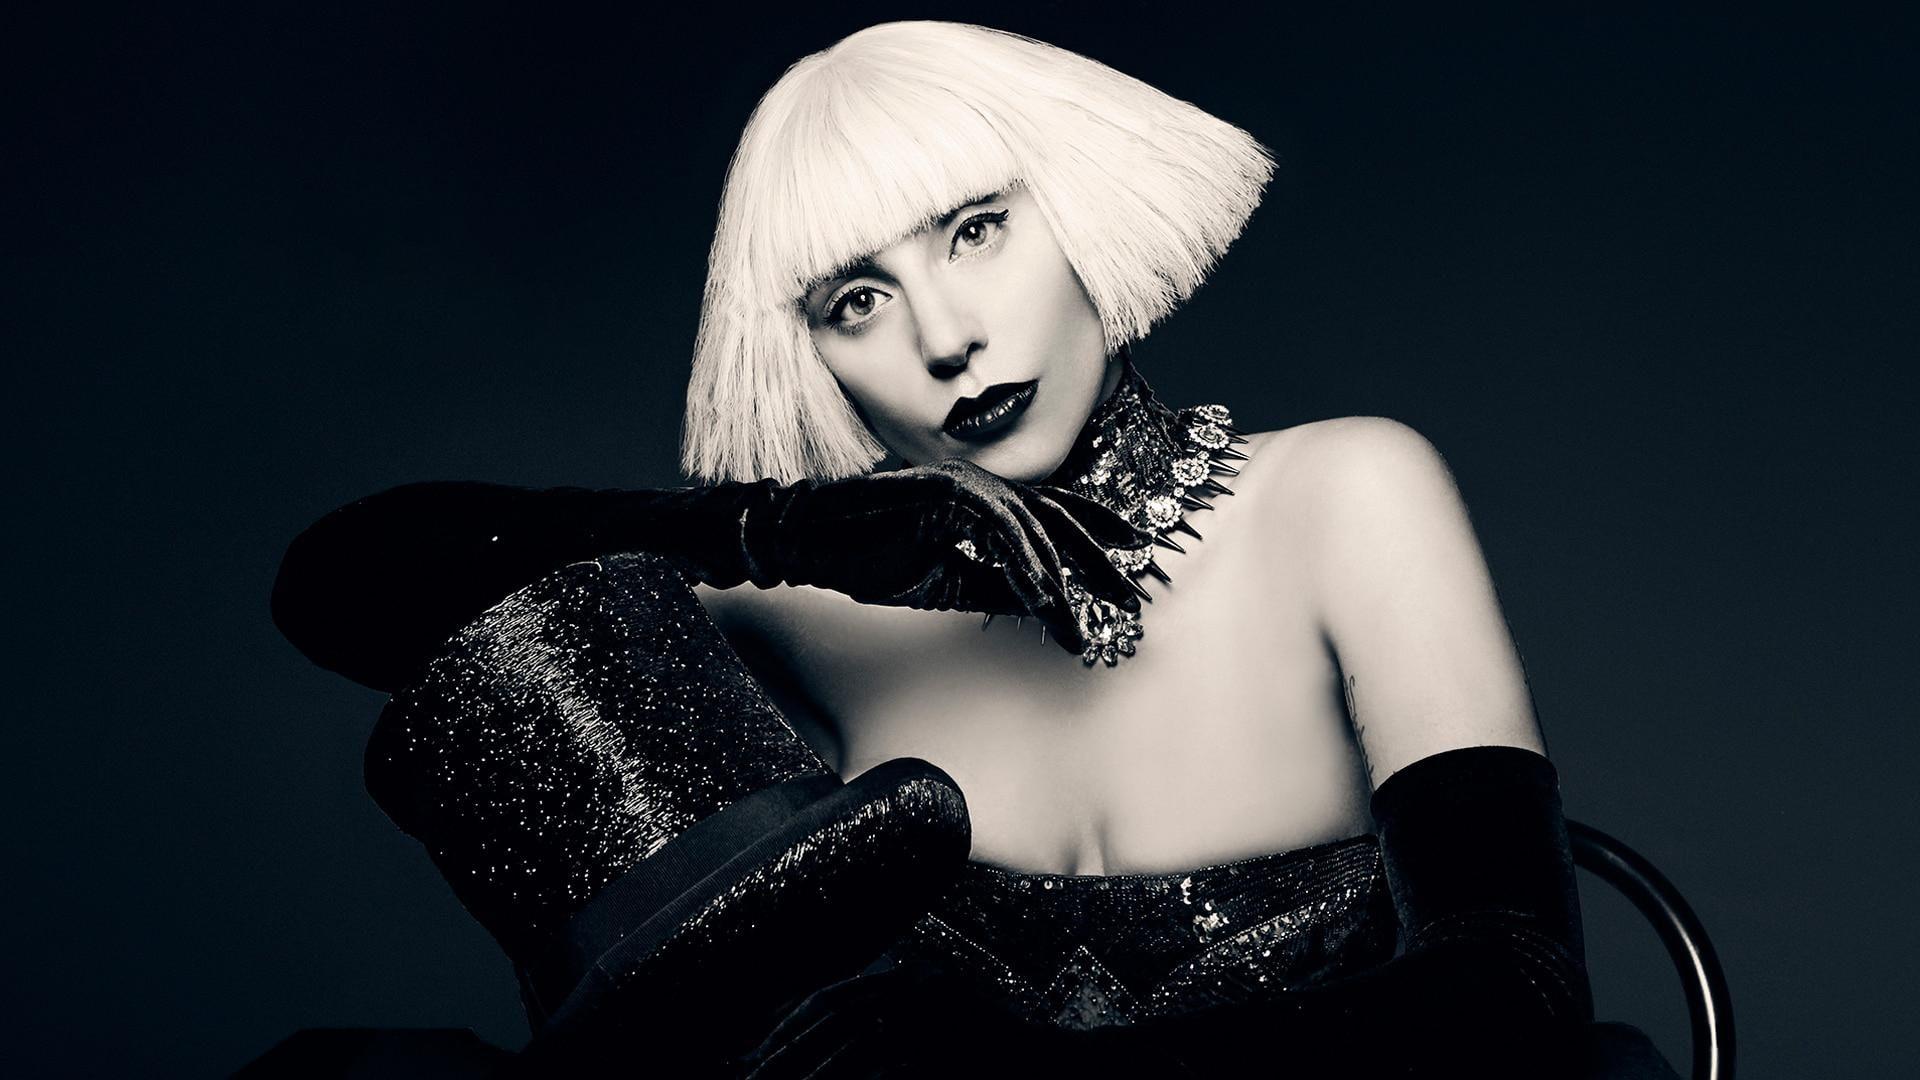 Lady Gaga: November 16, 2013